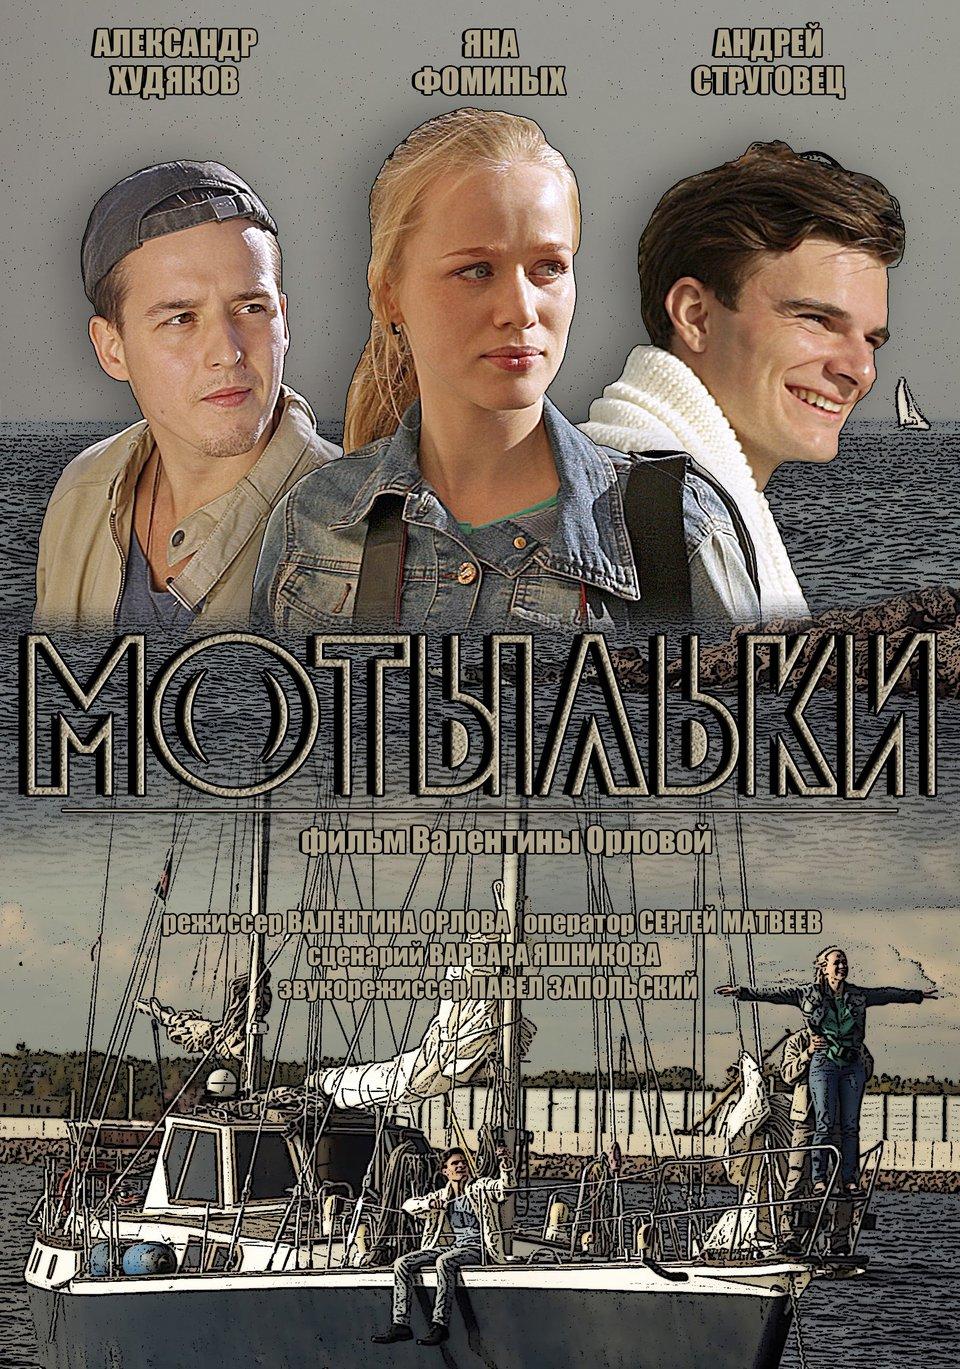 «Фильм Мотыльки Актёры» — 2016